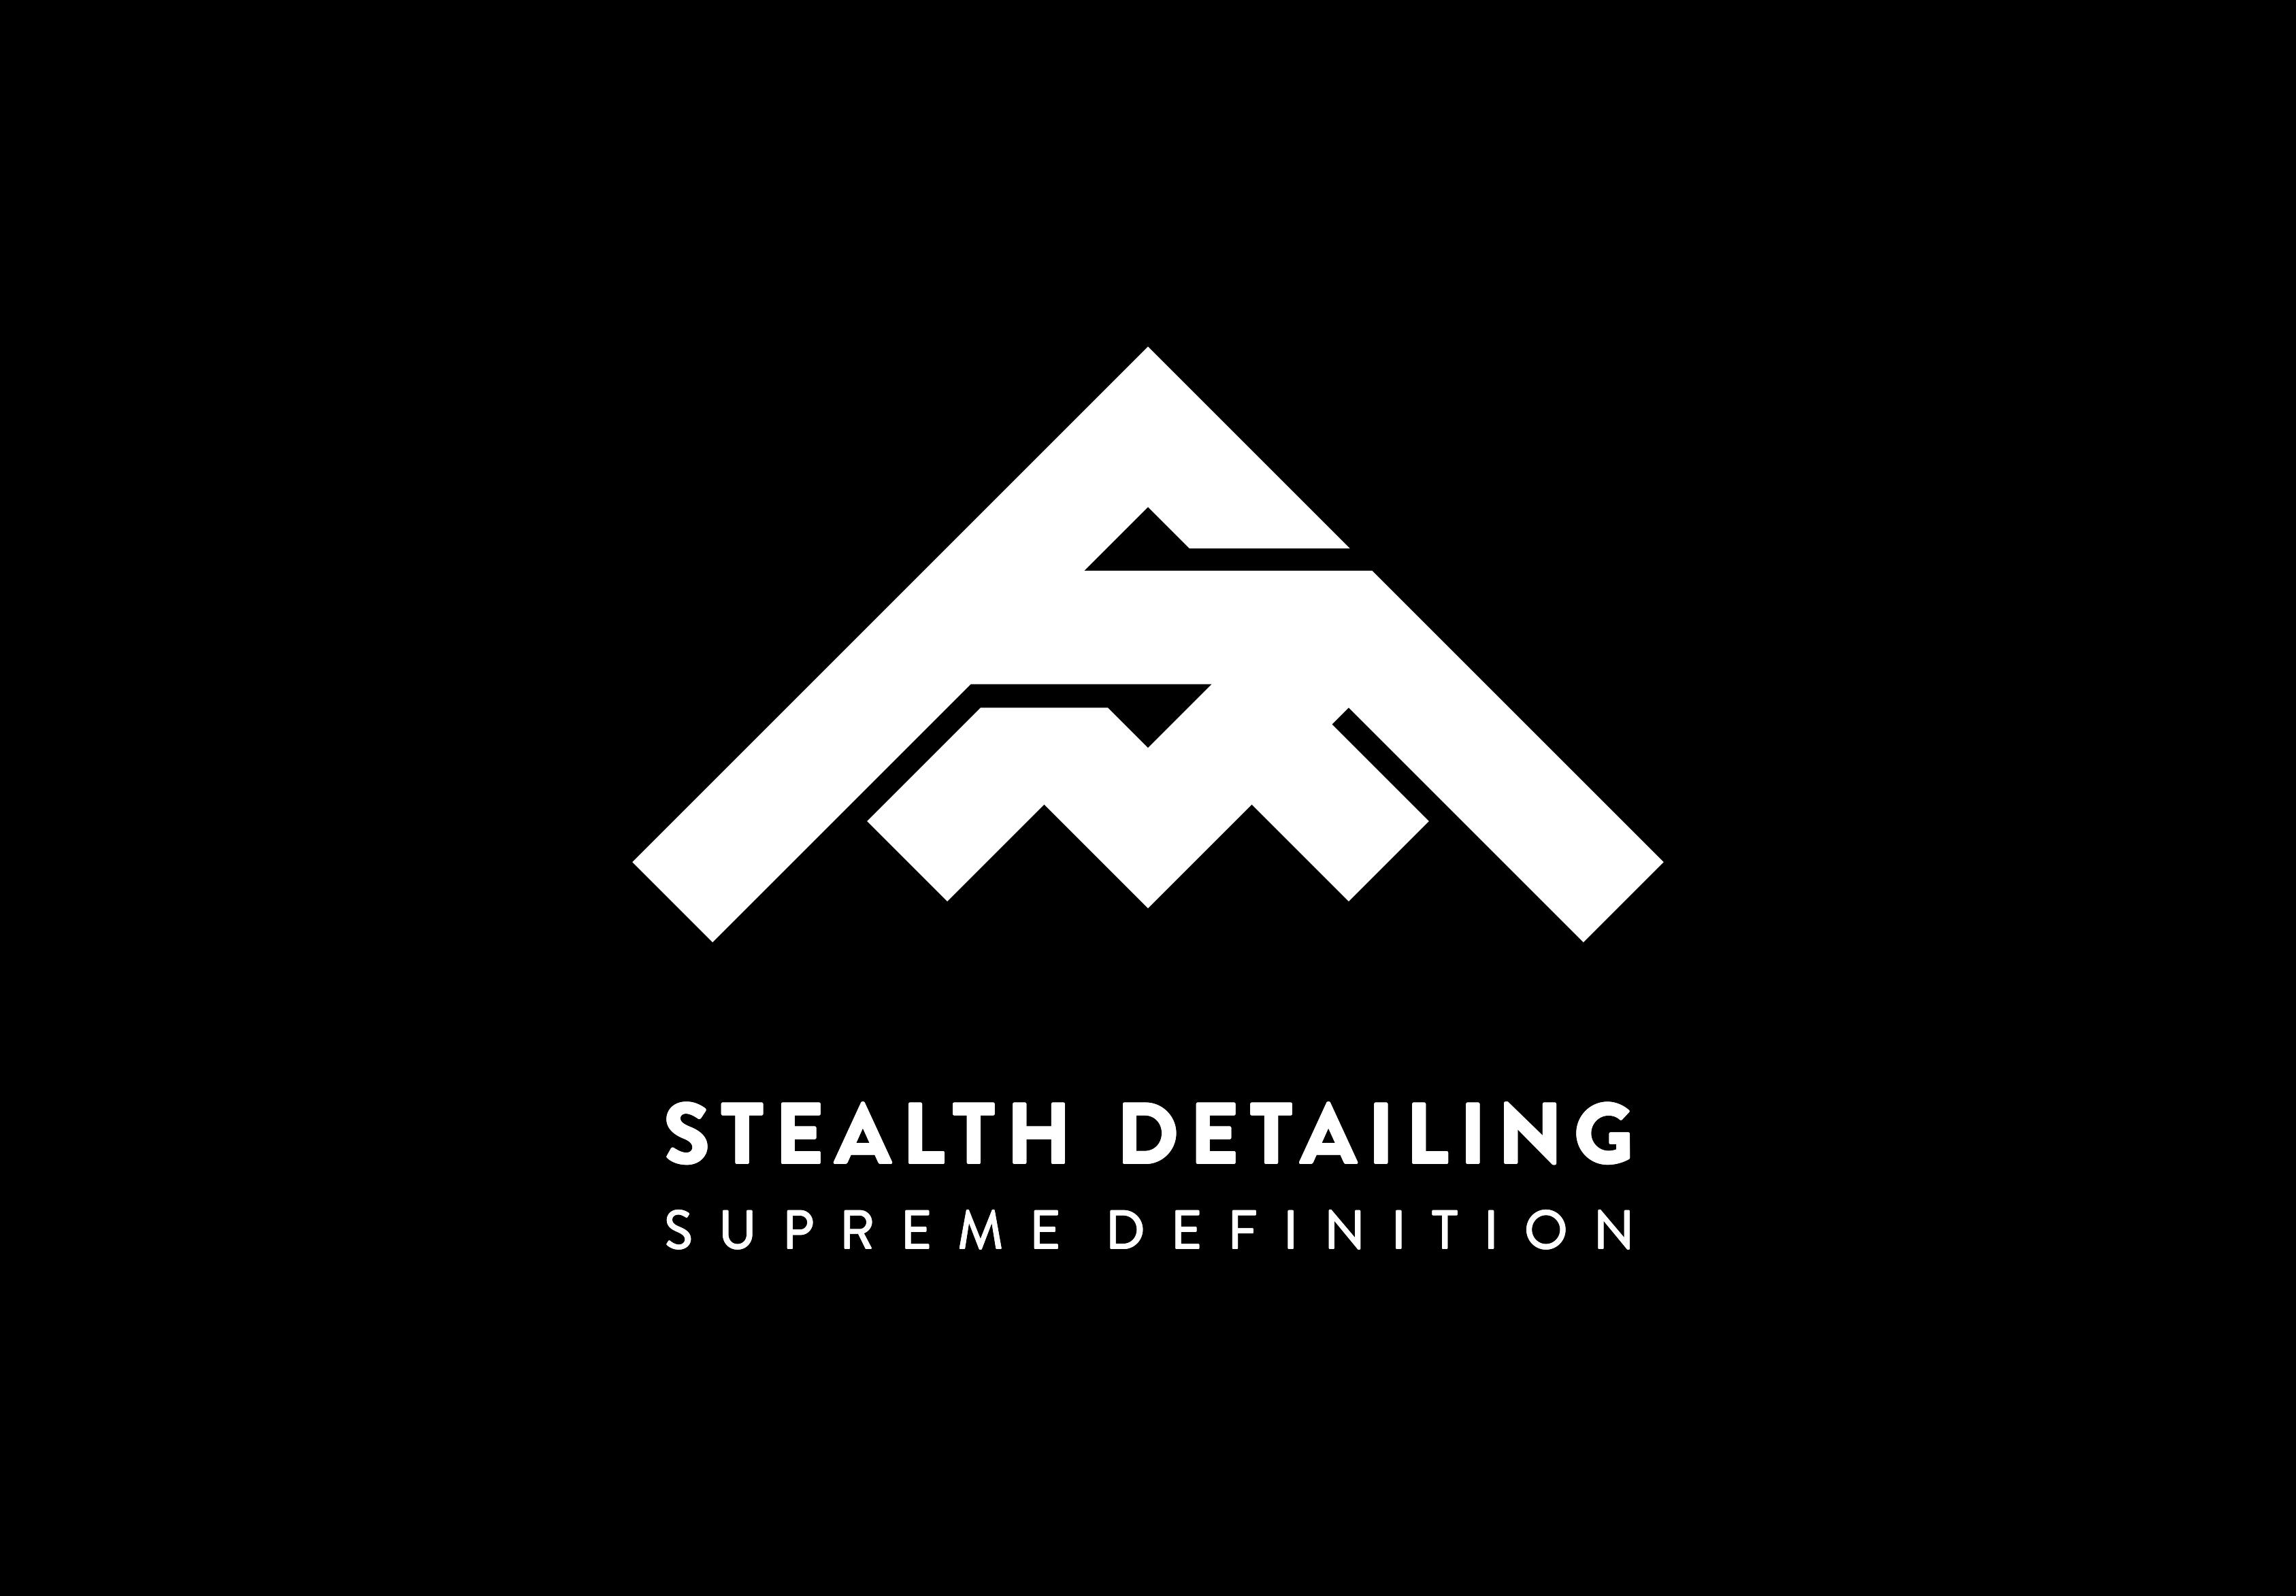 Stealth Detailing